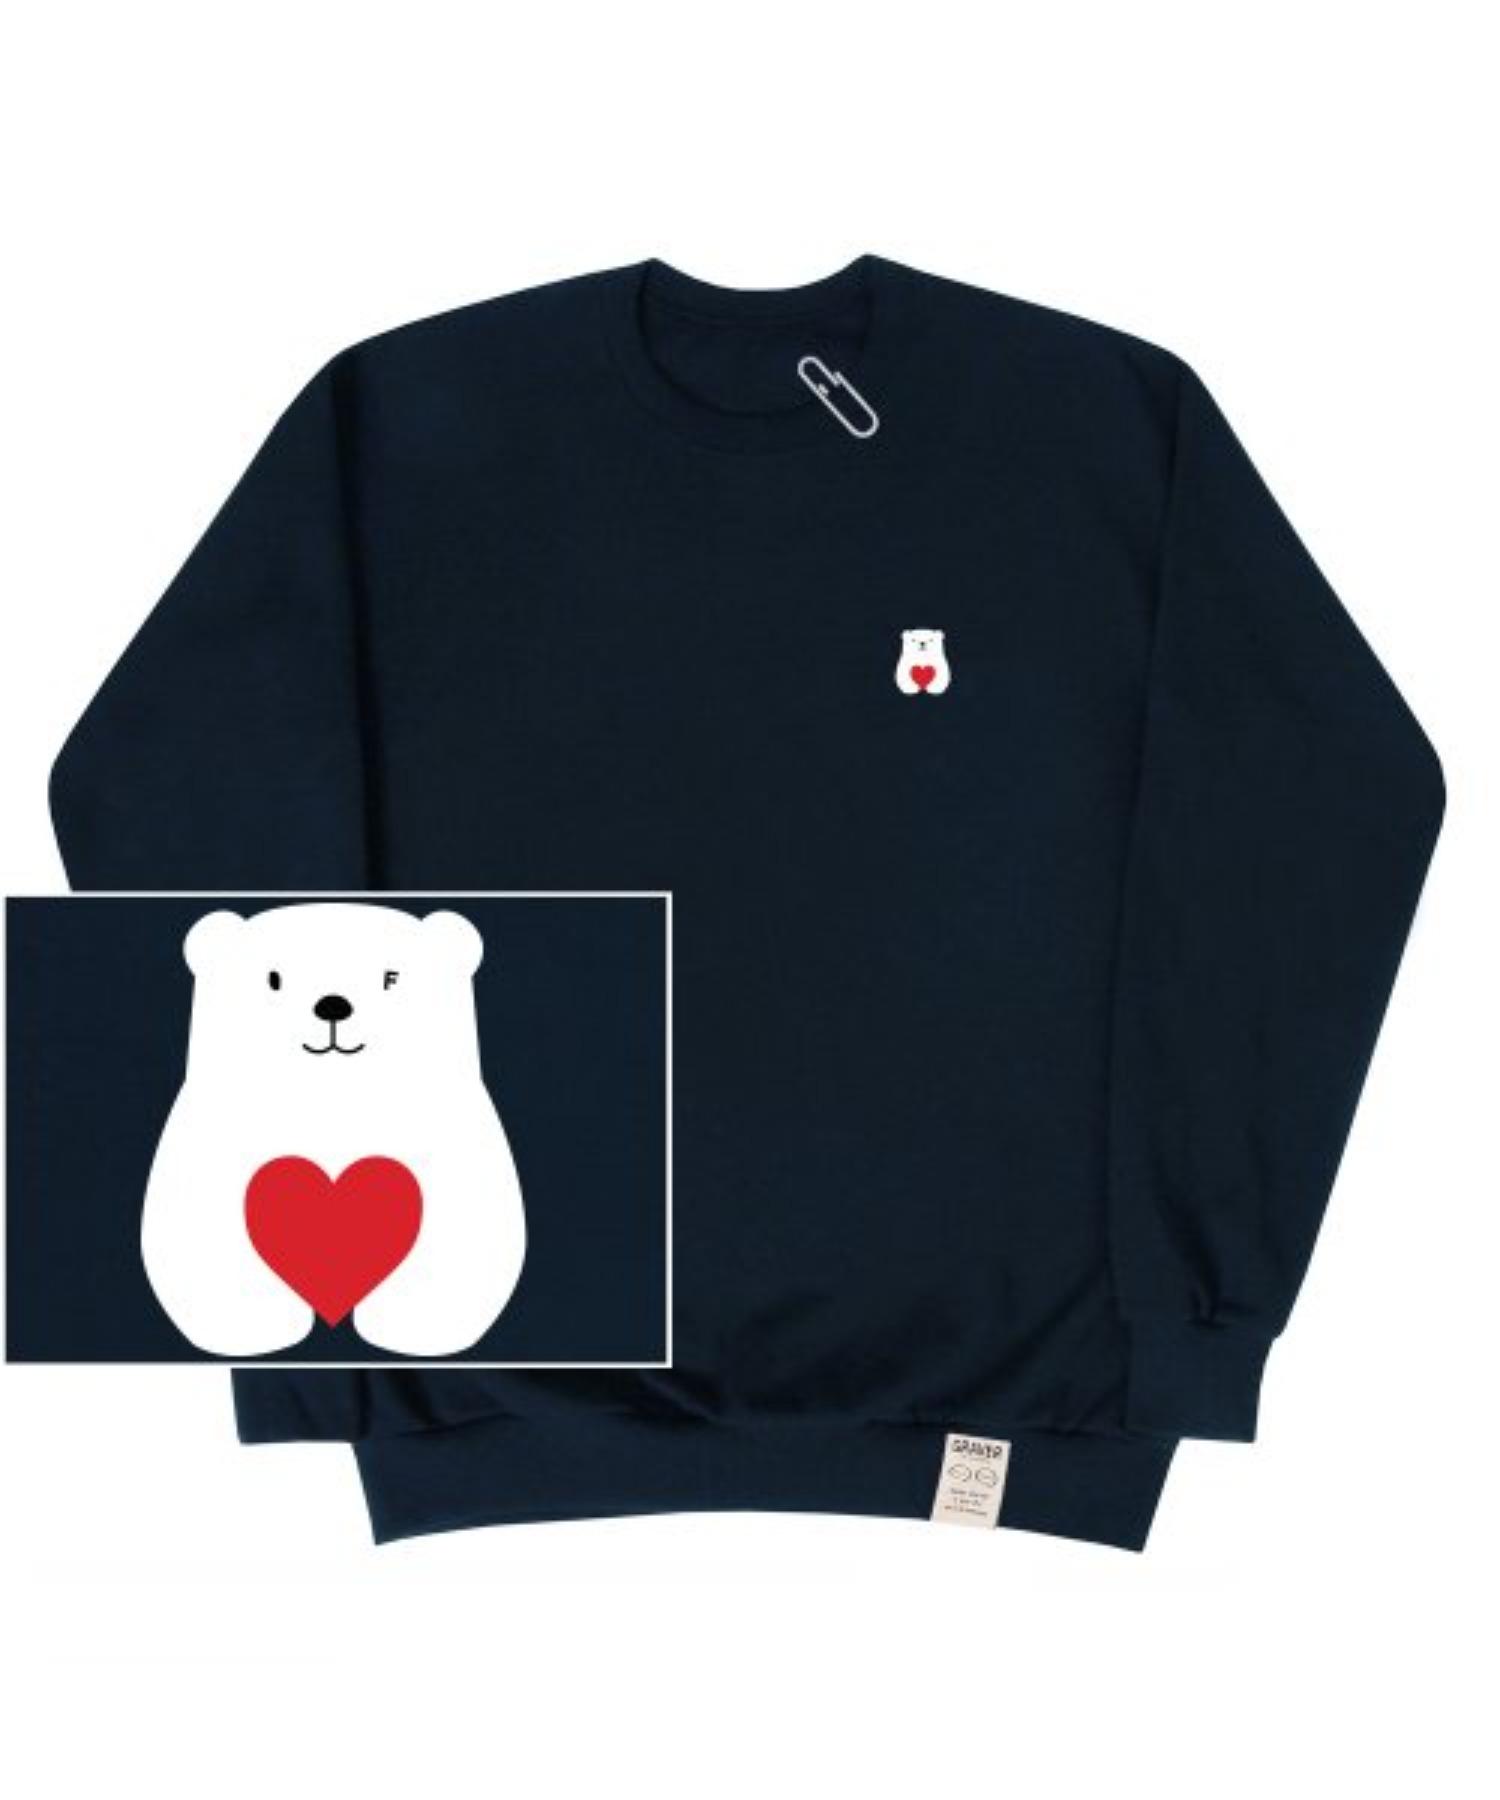 [UNISEX] Small Polar Bear Red Heart White Clip Sweatshirt_Navy